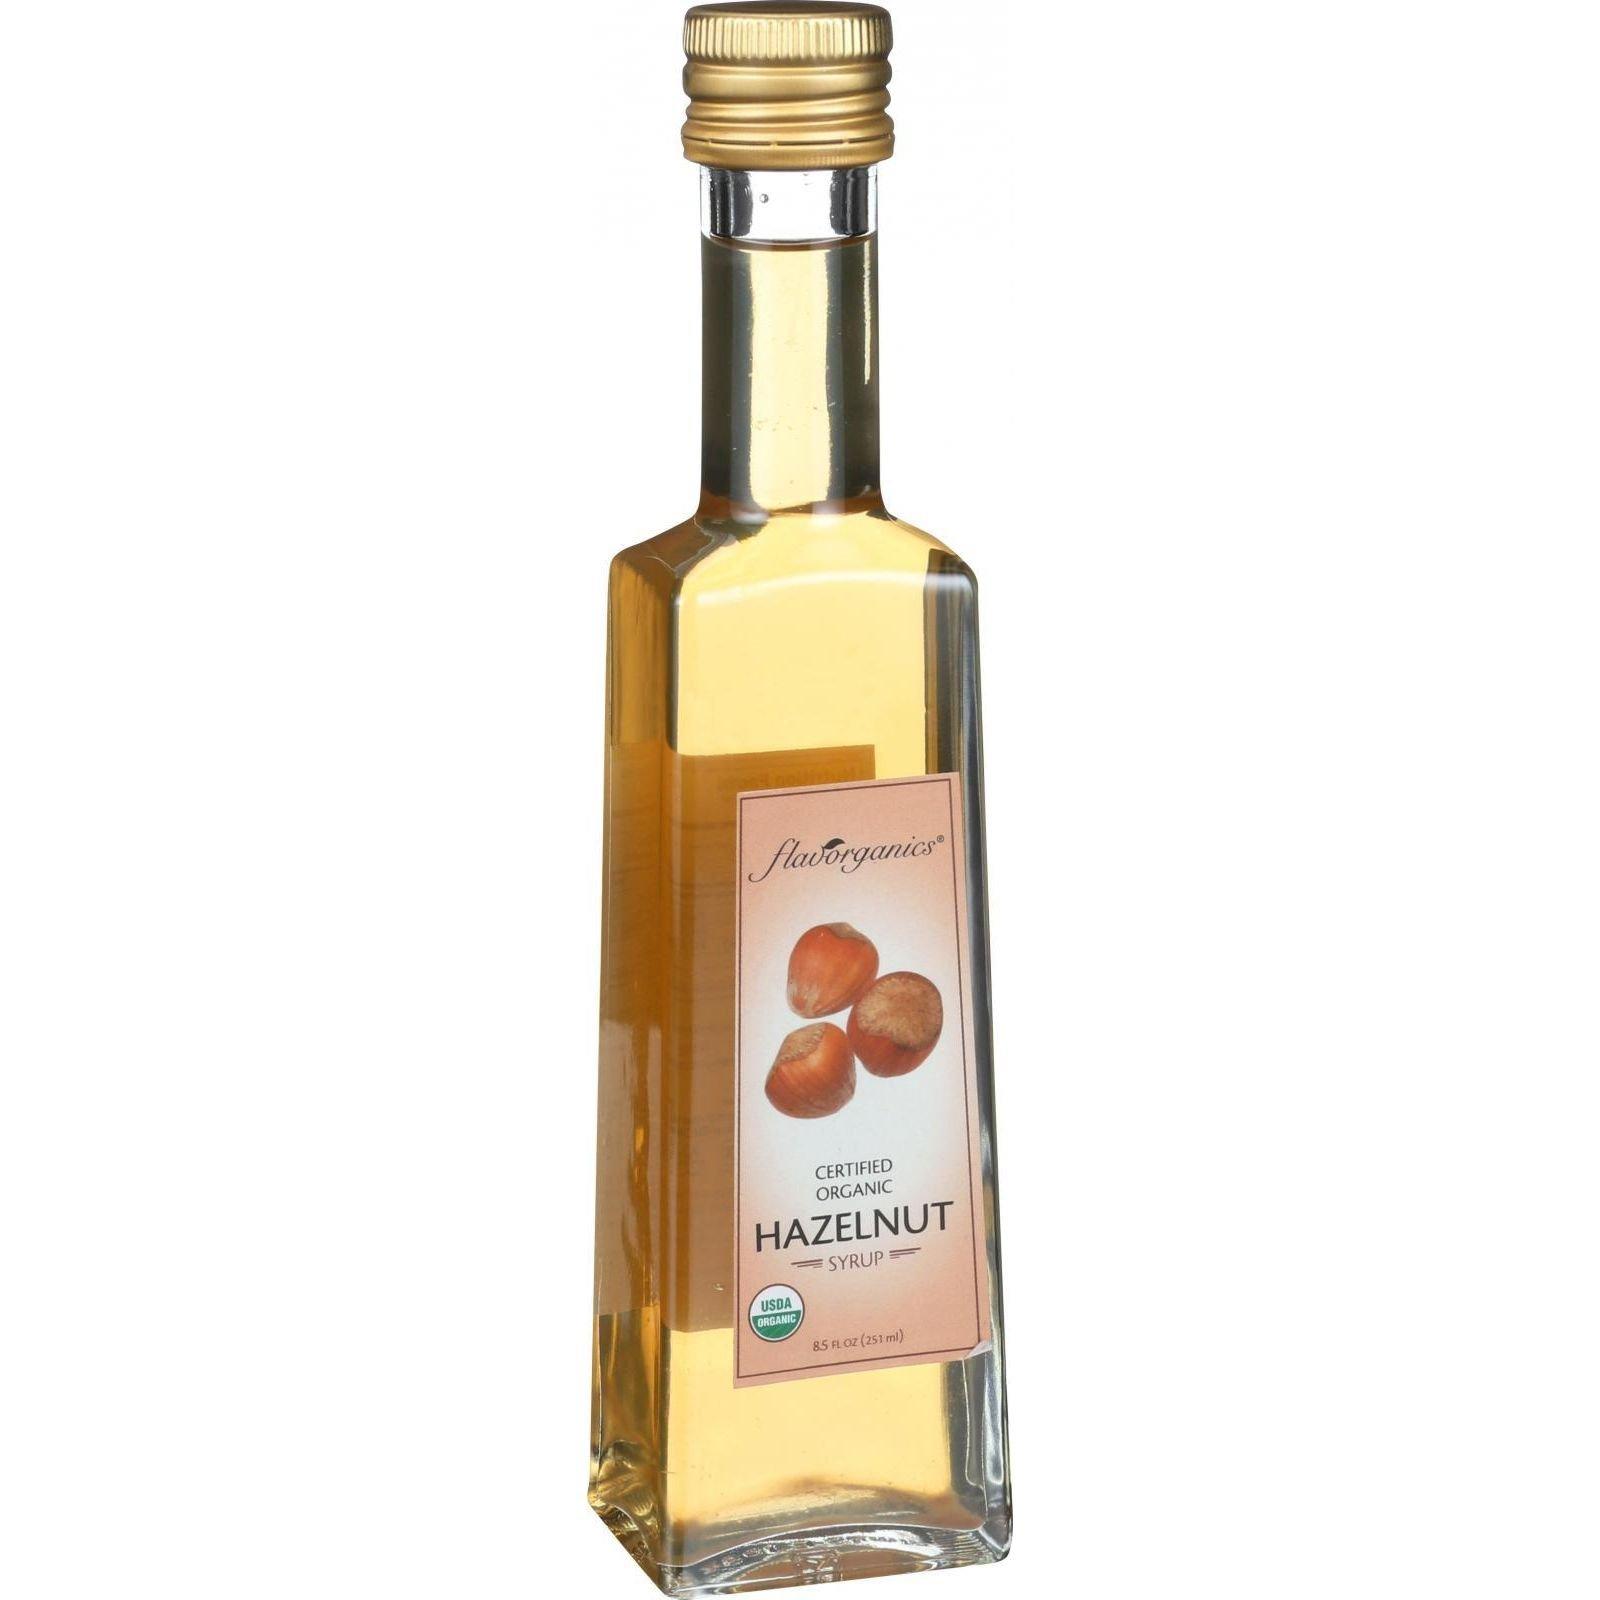 Flavorganics Organic Hazelnut Syrup, 8.5 oz